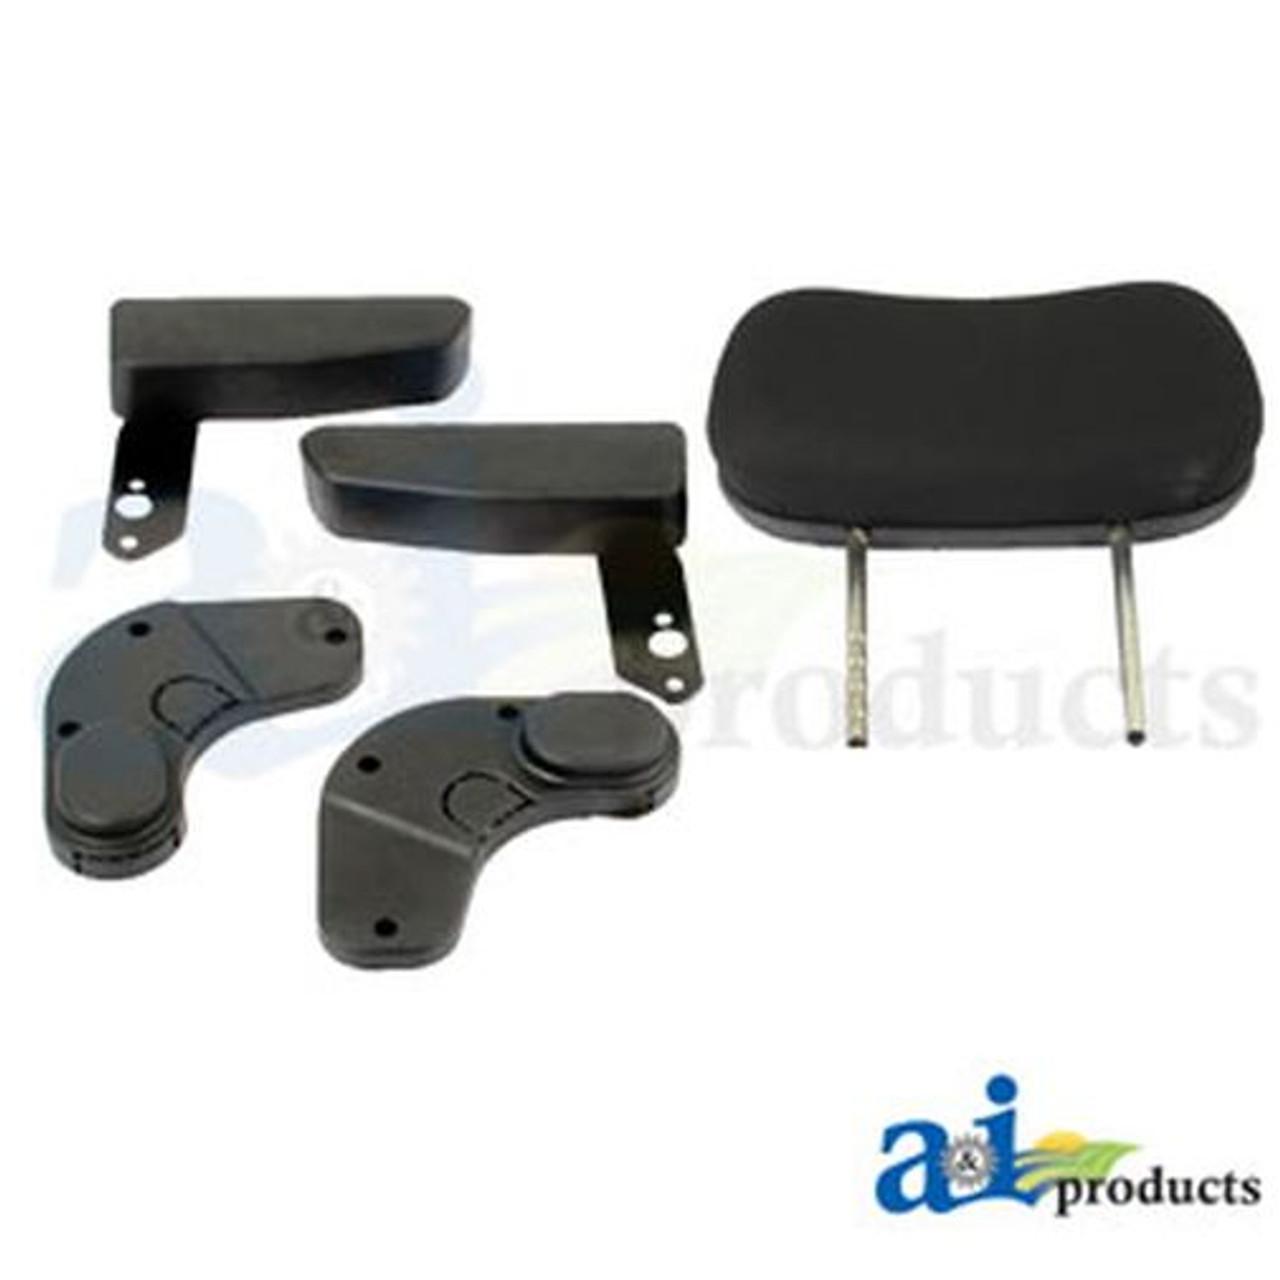 Seat, F10 Series, Air Suspension / Armrest / Headrest / Black Cloth